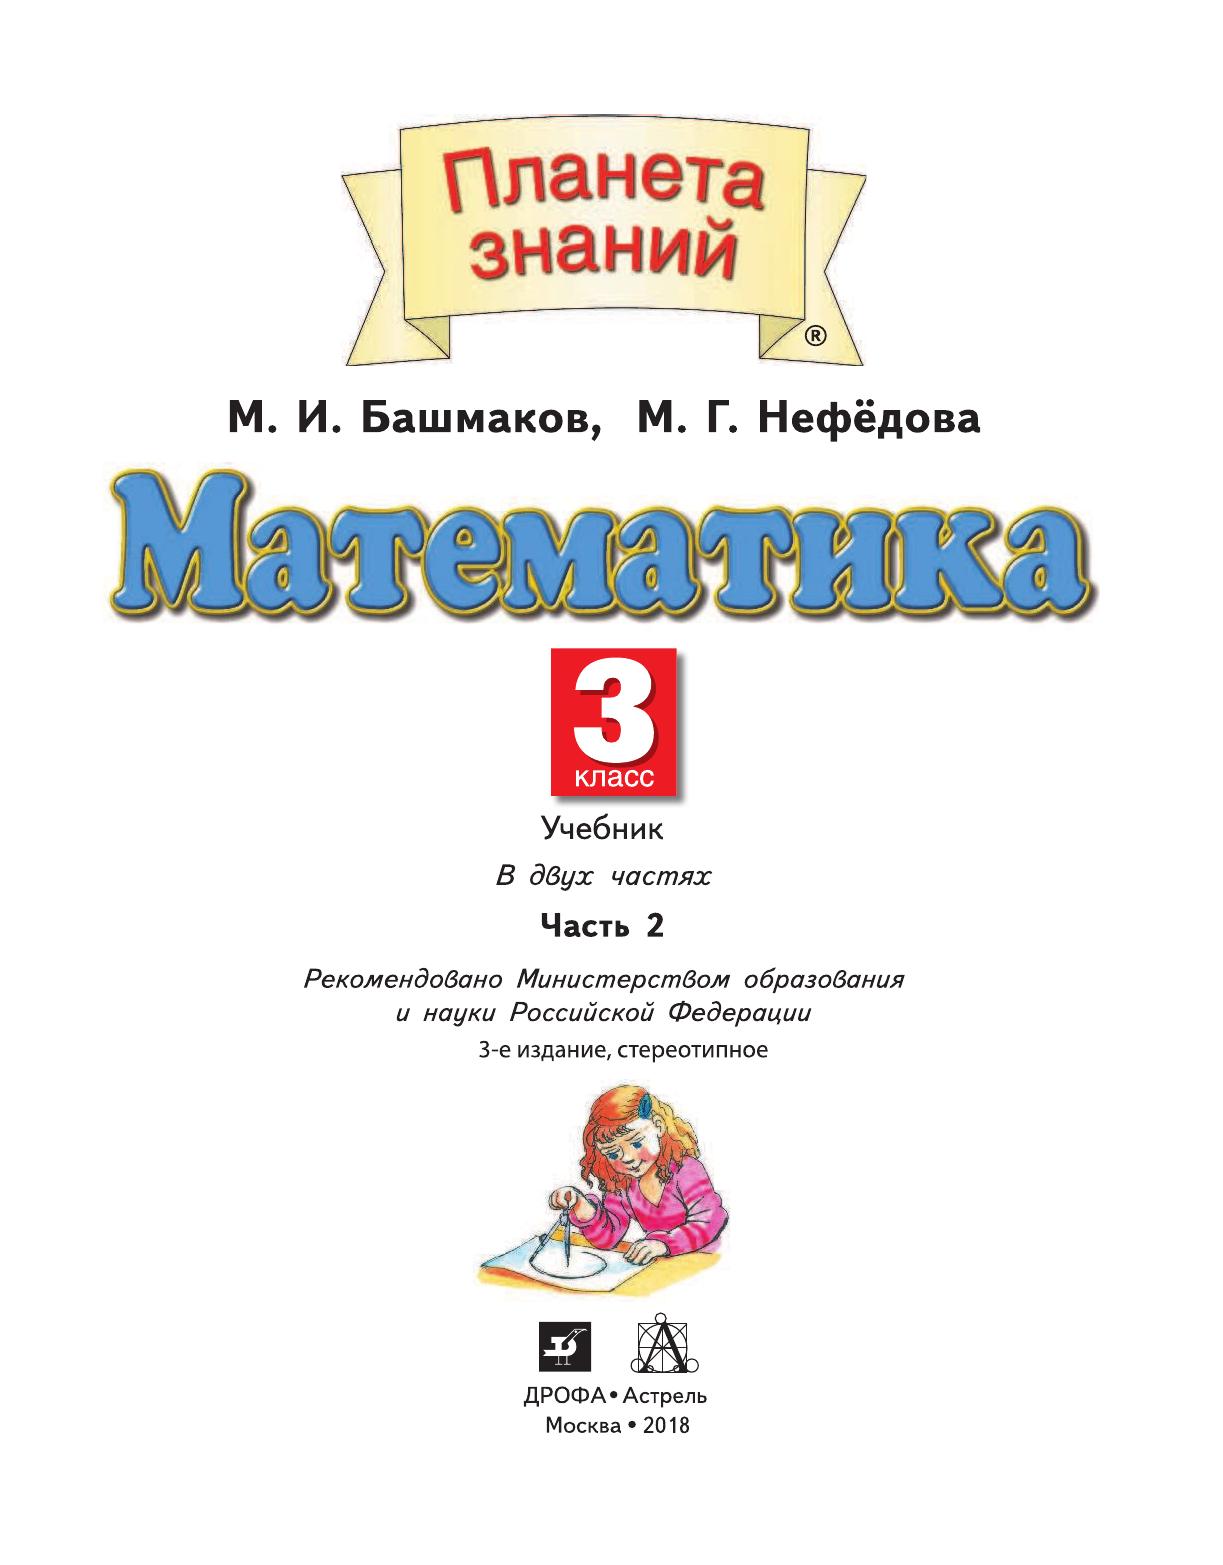 Математике 3 по класс башмаков,нефёдова гдз учебник